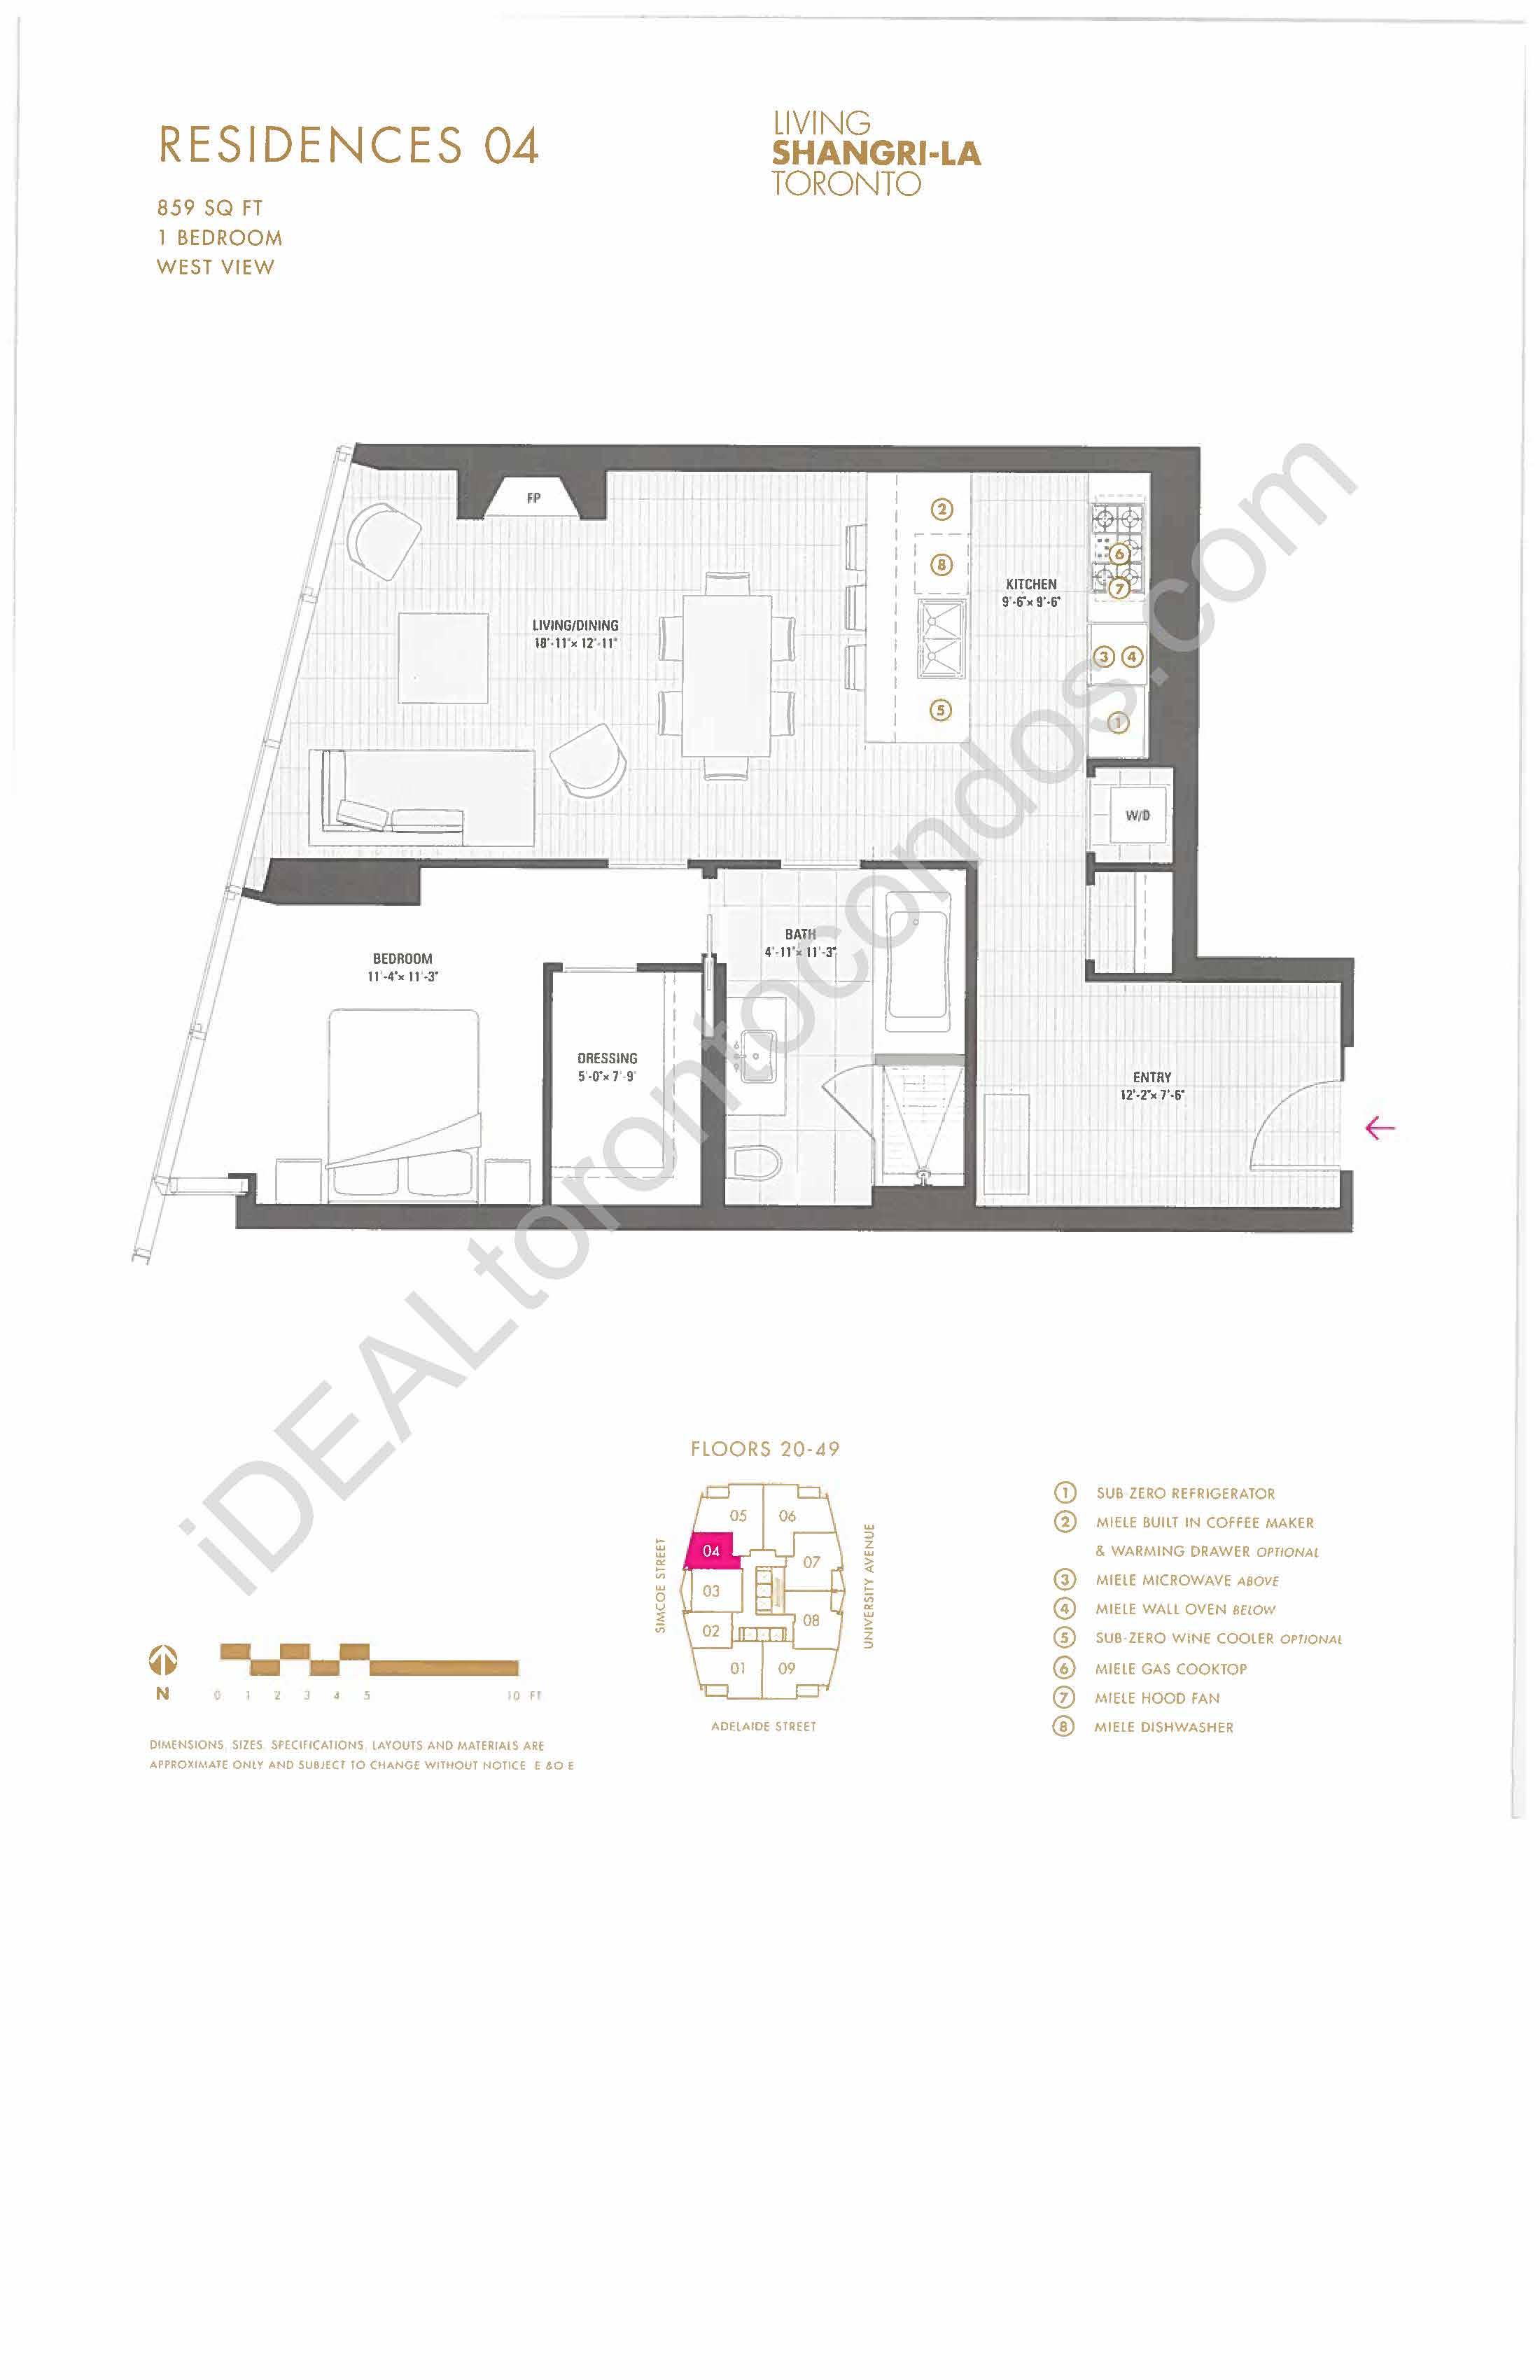 Residence 04 - 1 Bedroom